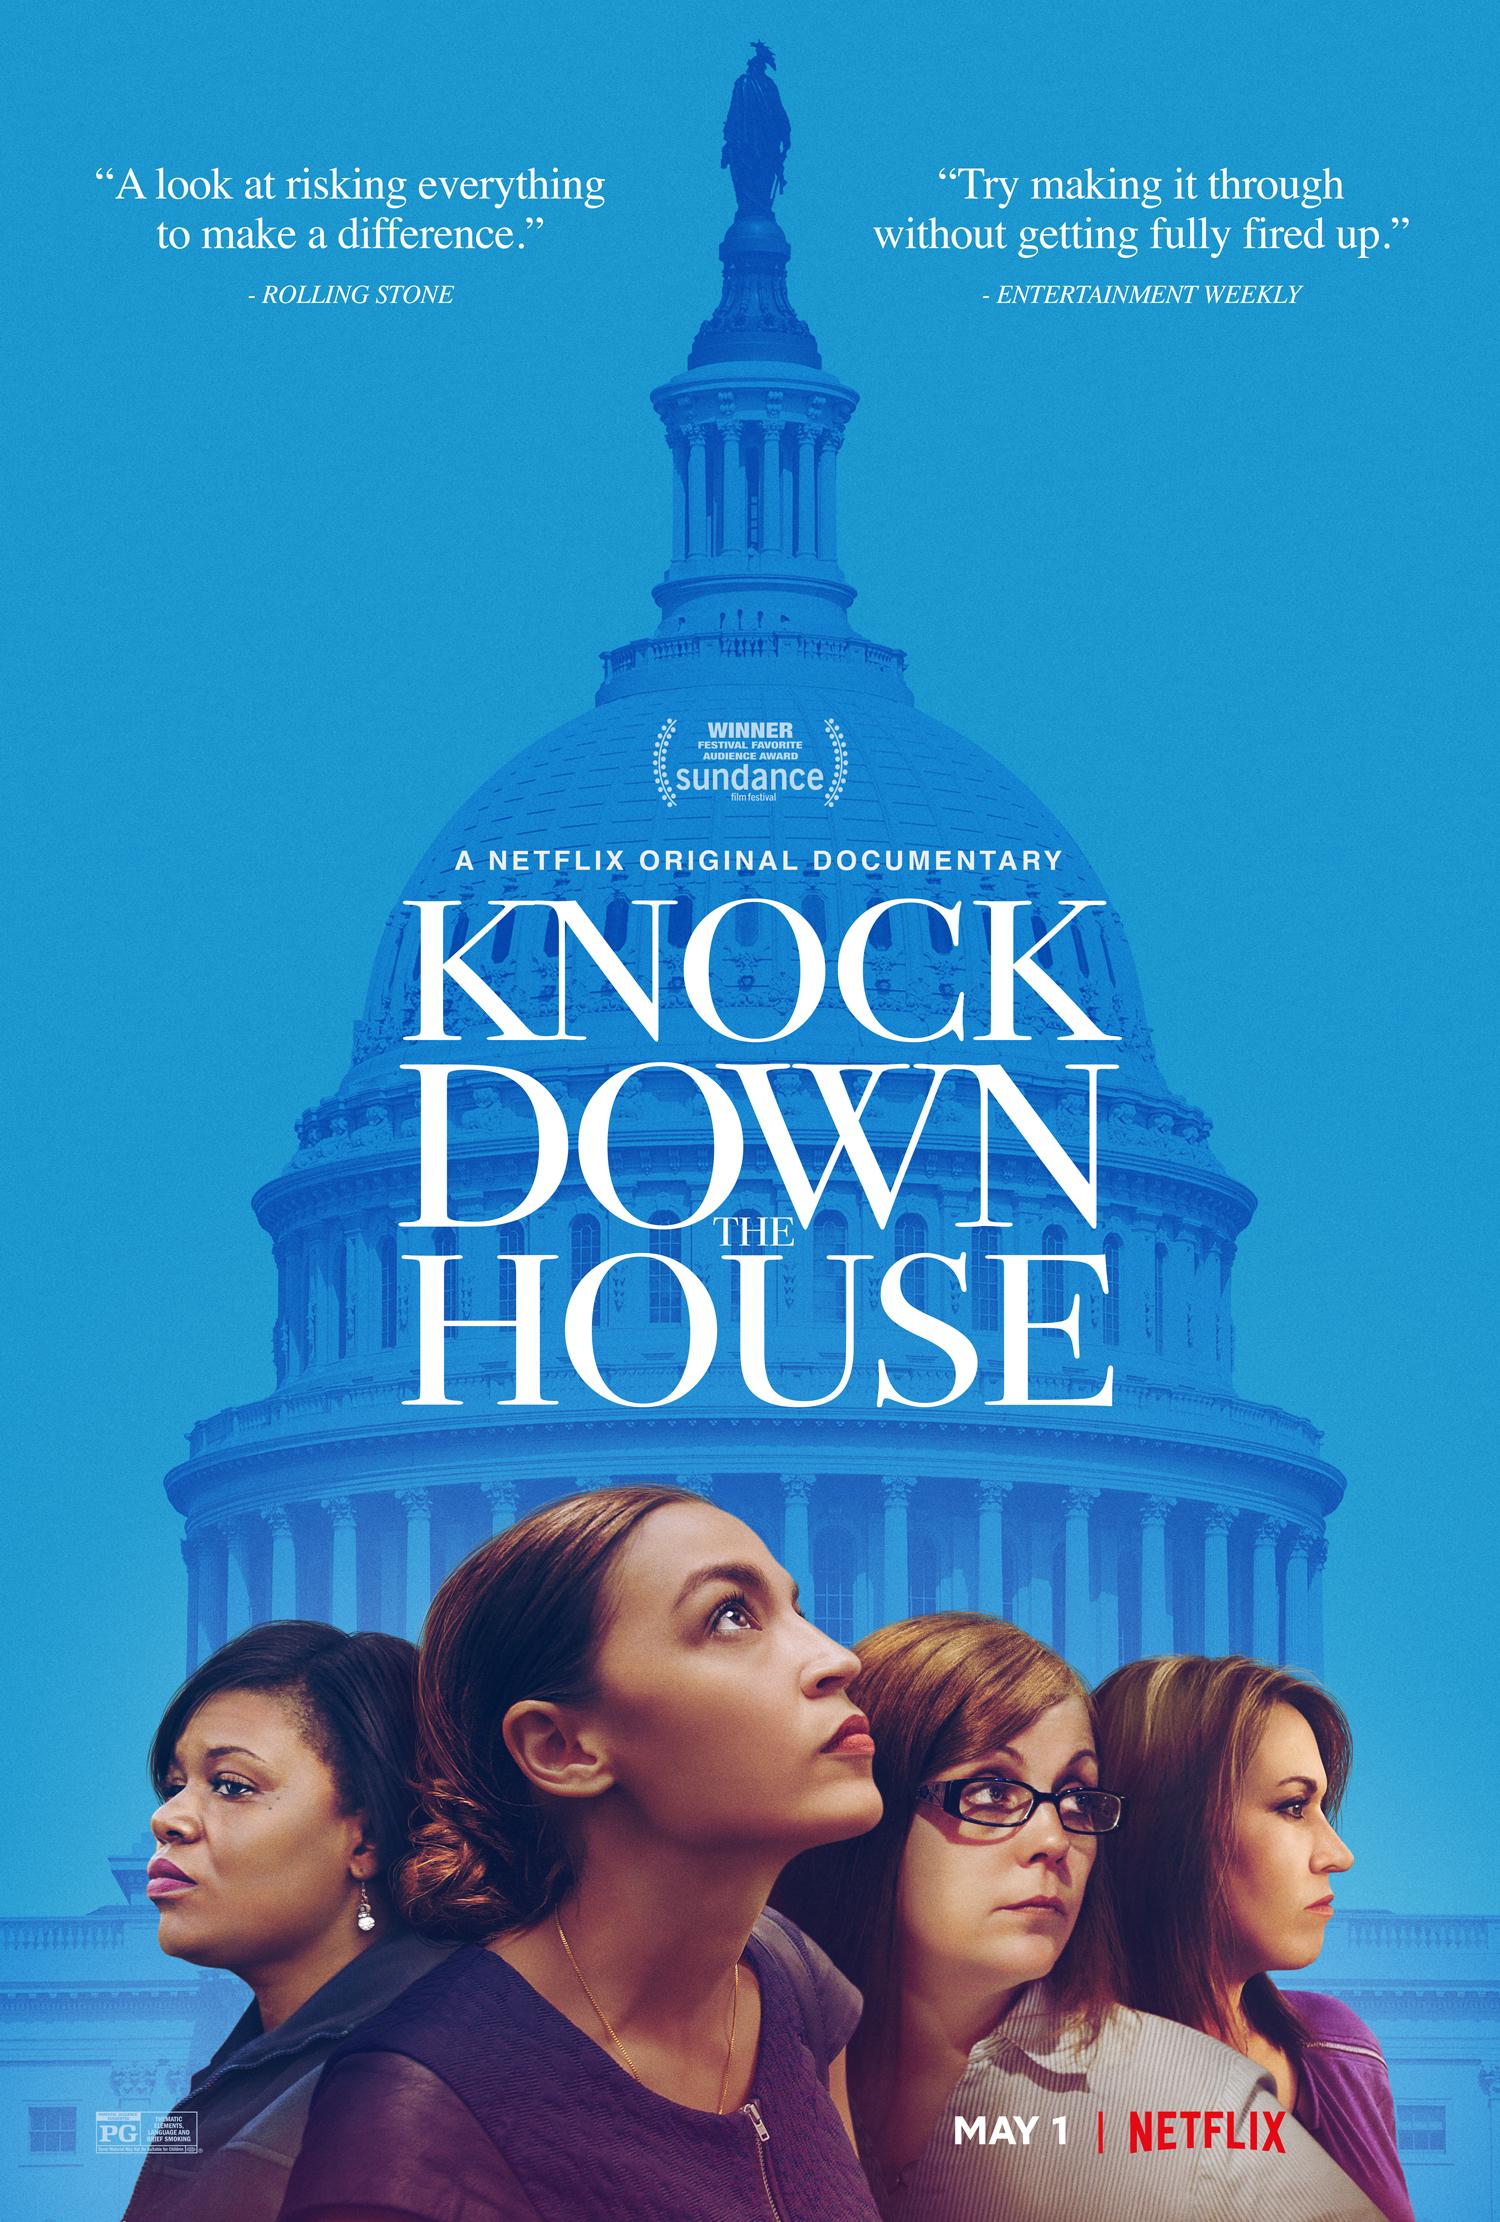 Knock Down The House.jpg